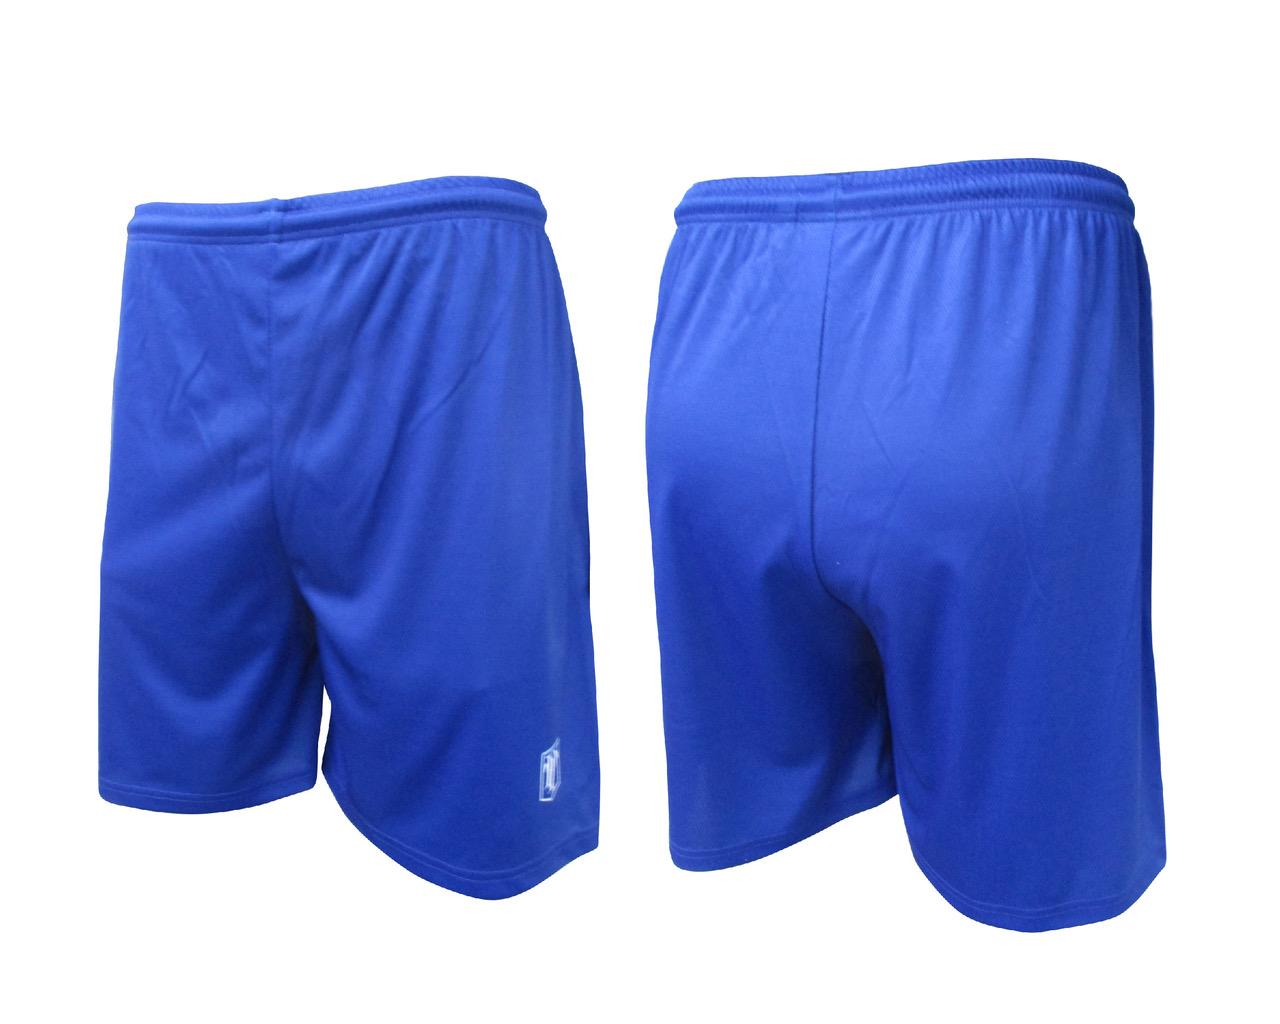 Teeball Playing Shorts